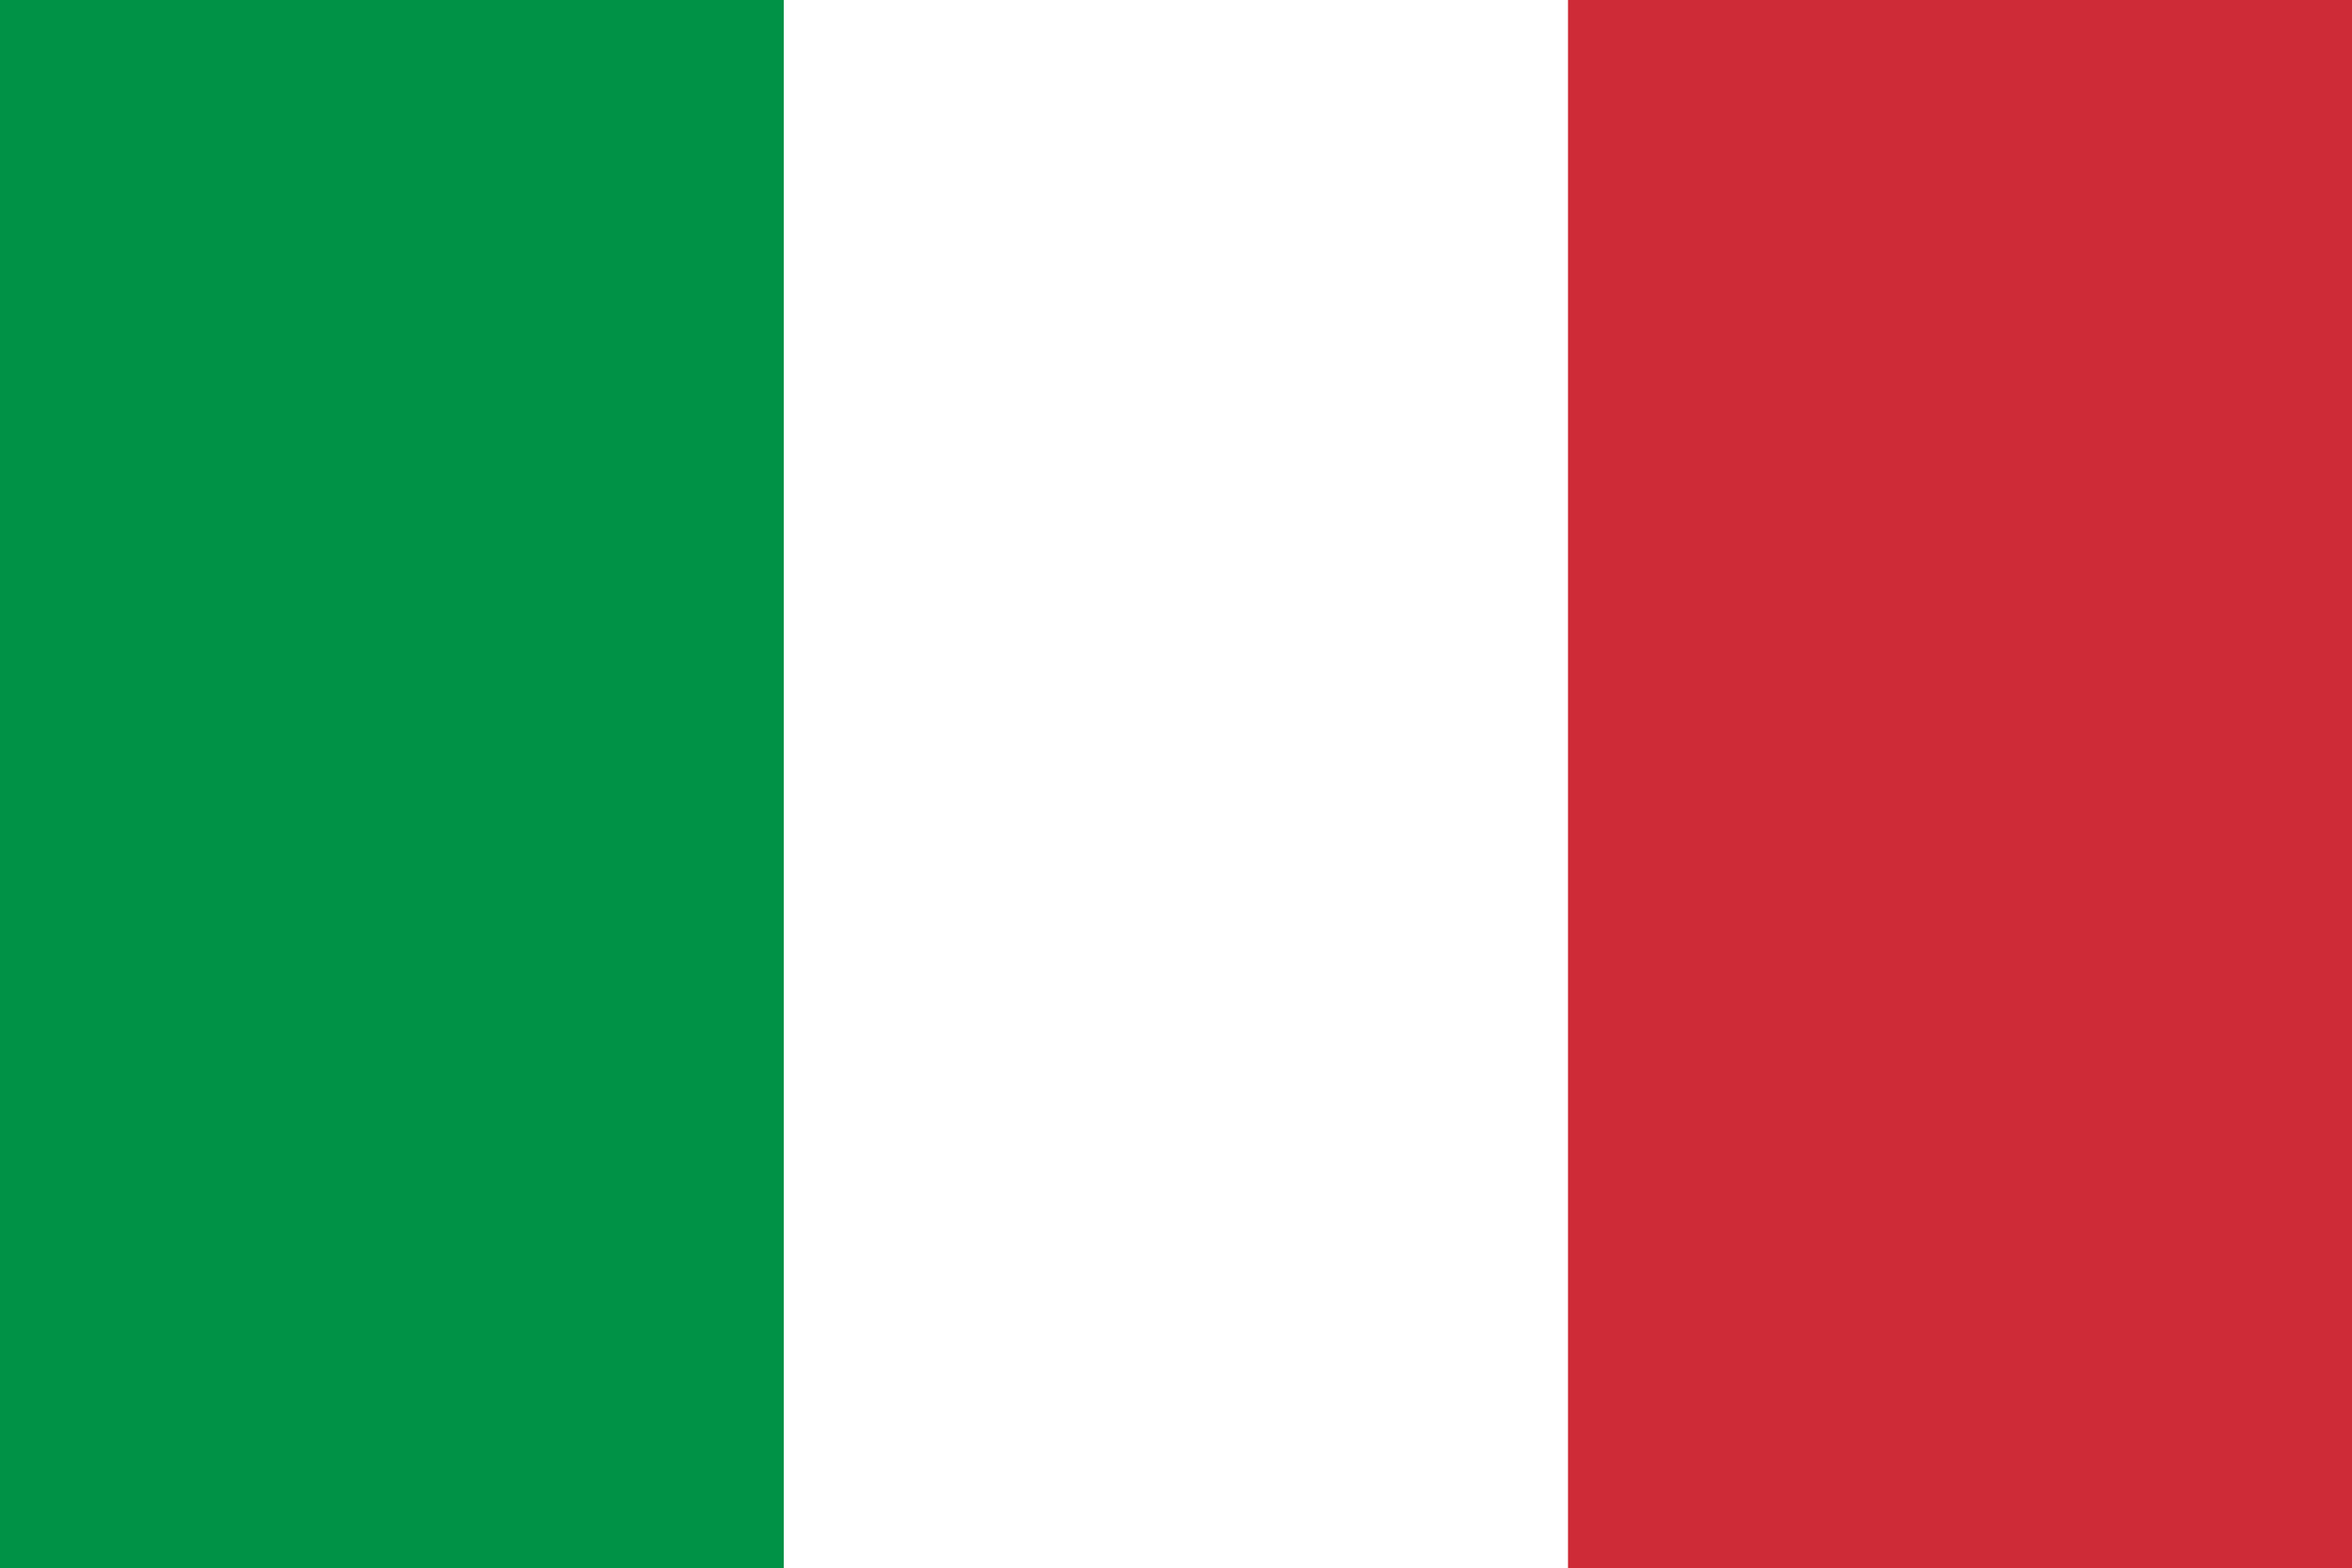 Italie, pays, emblème, logo, symbole - Fonds d'écran HD - Professor-falken.com